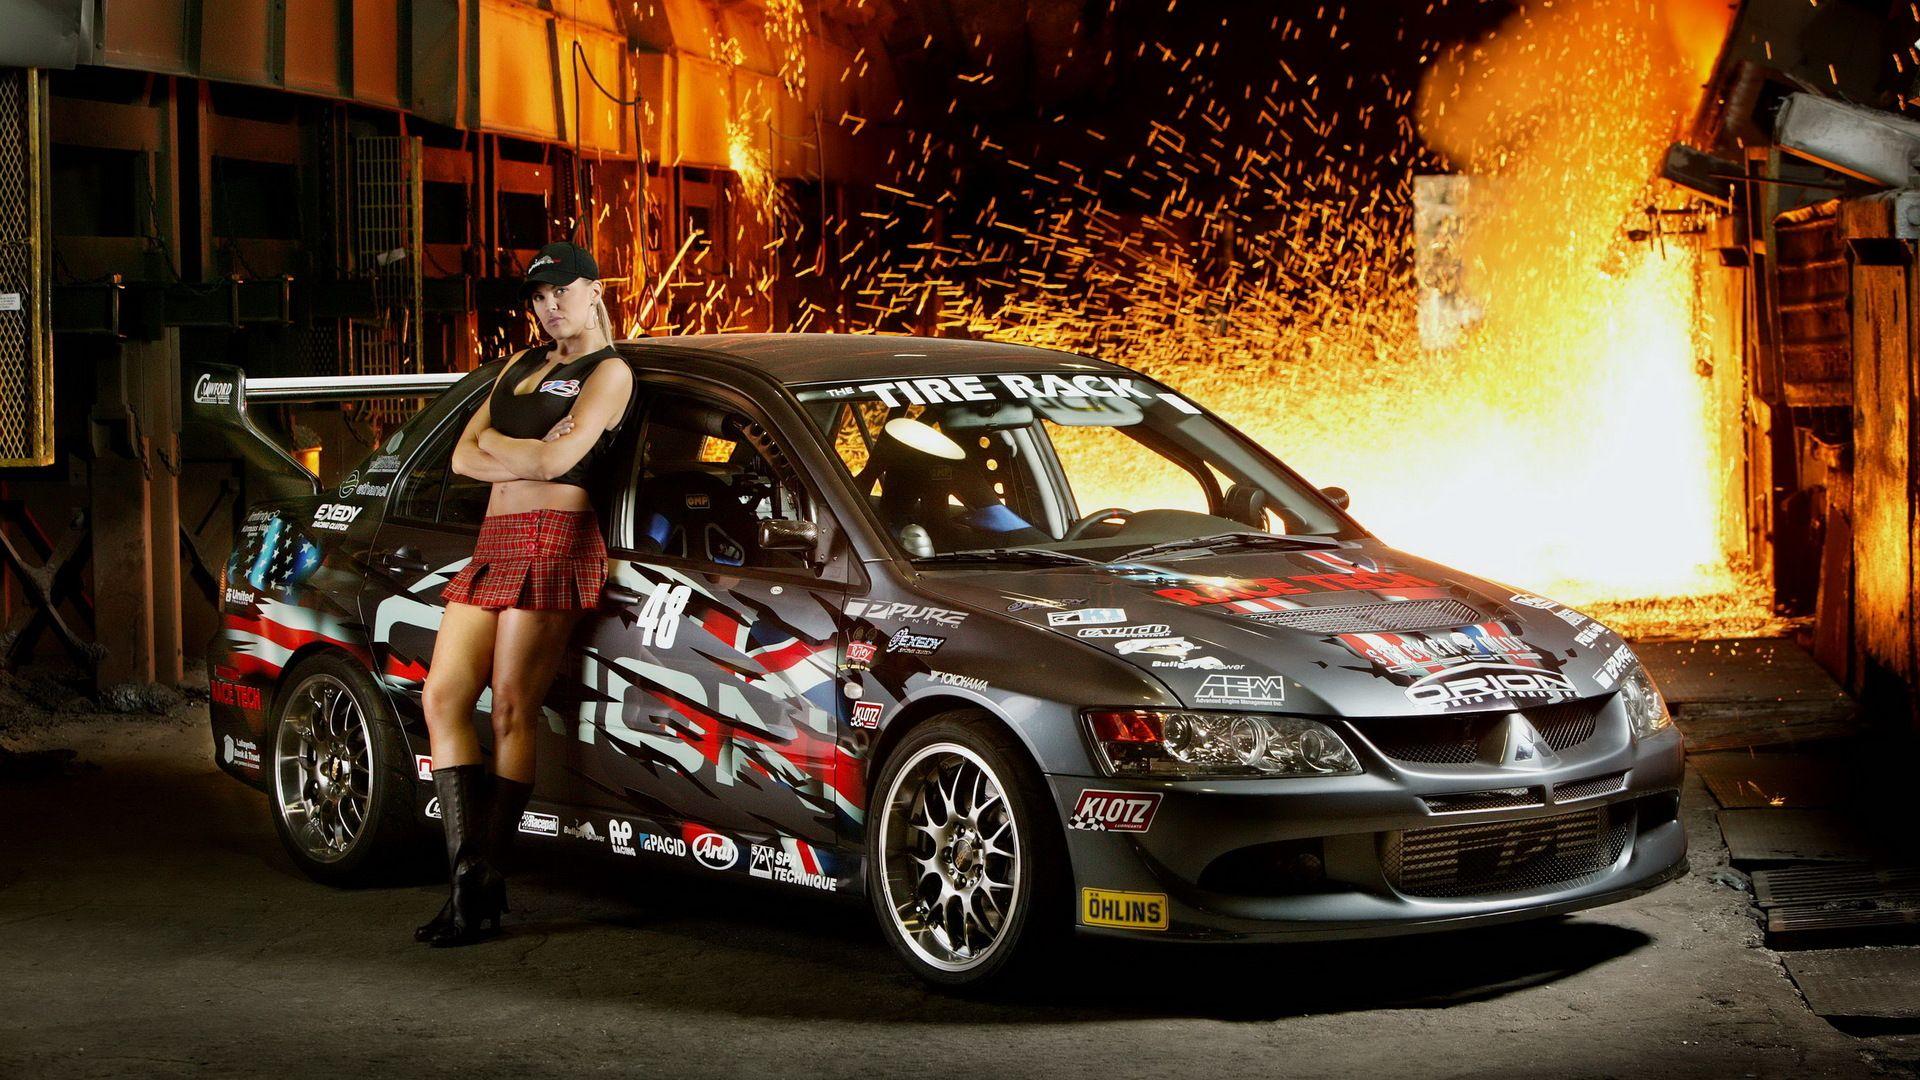 Car Girl background image